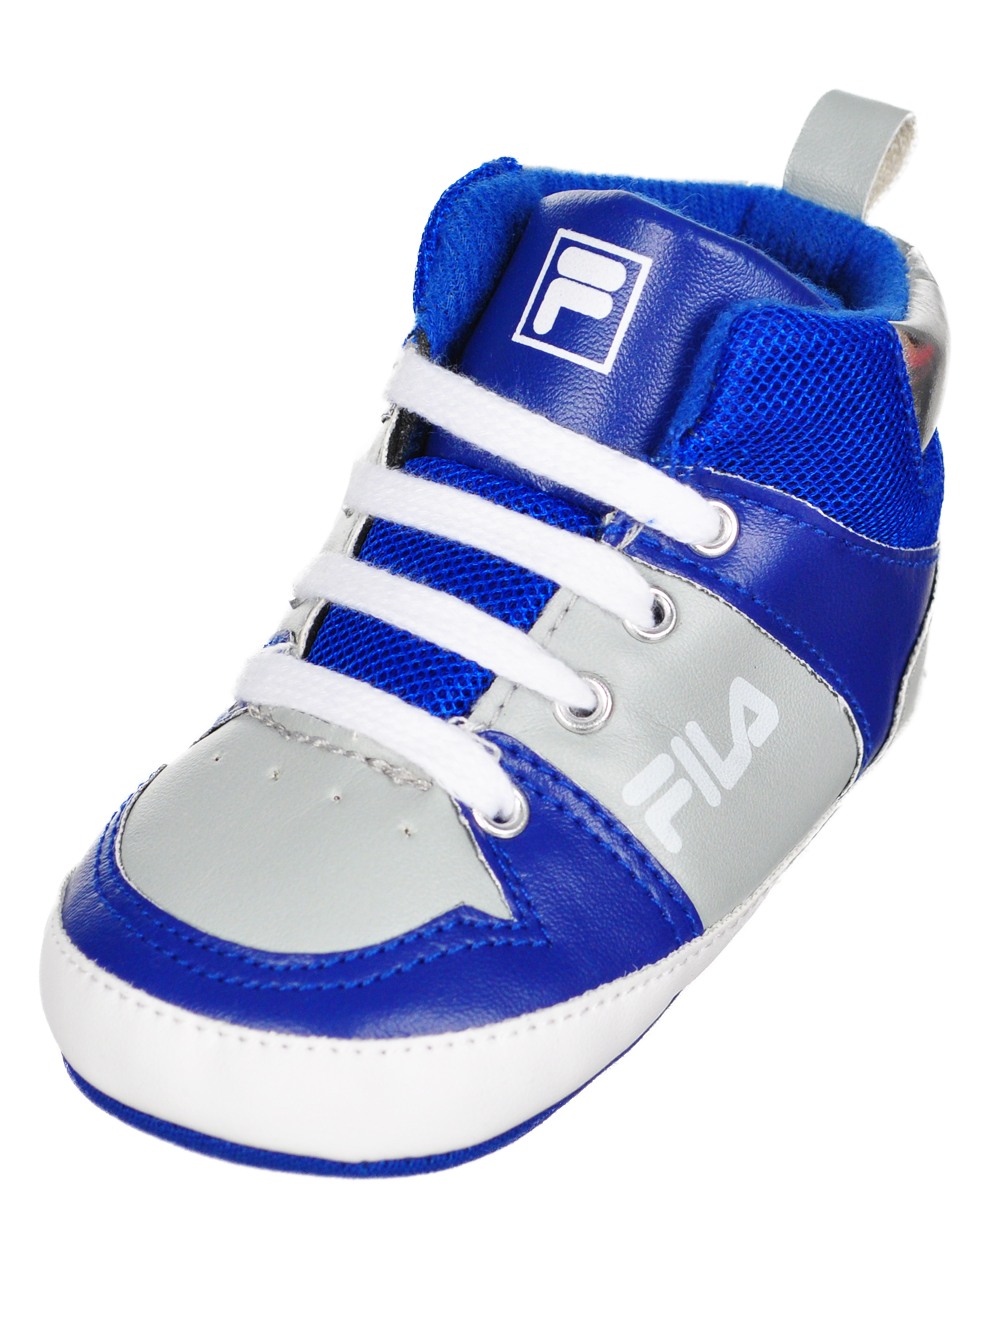 Fila Baby Boys' Sneaker Booties